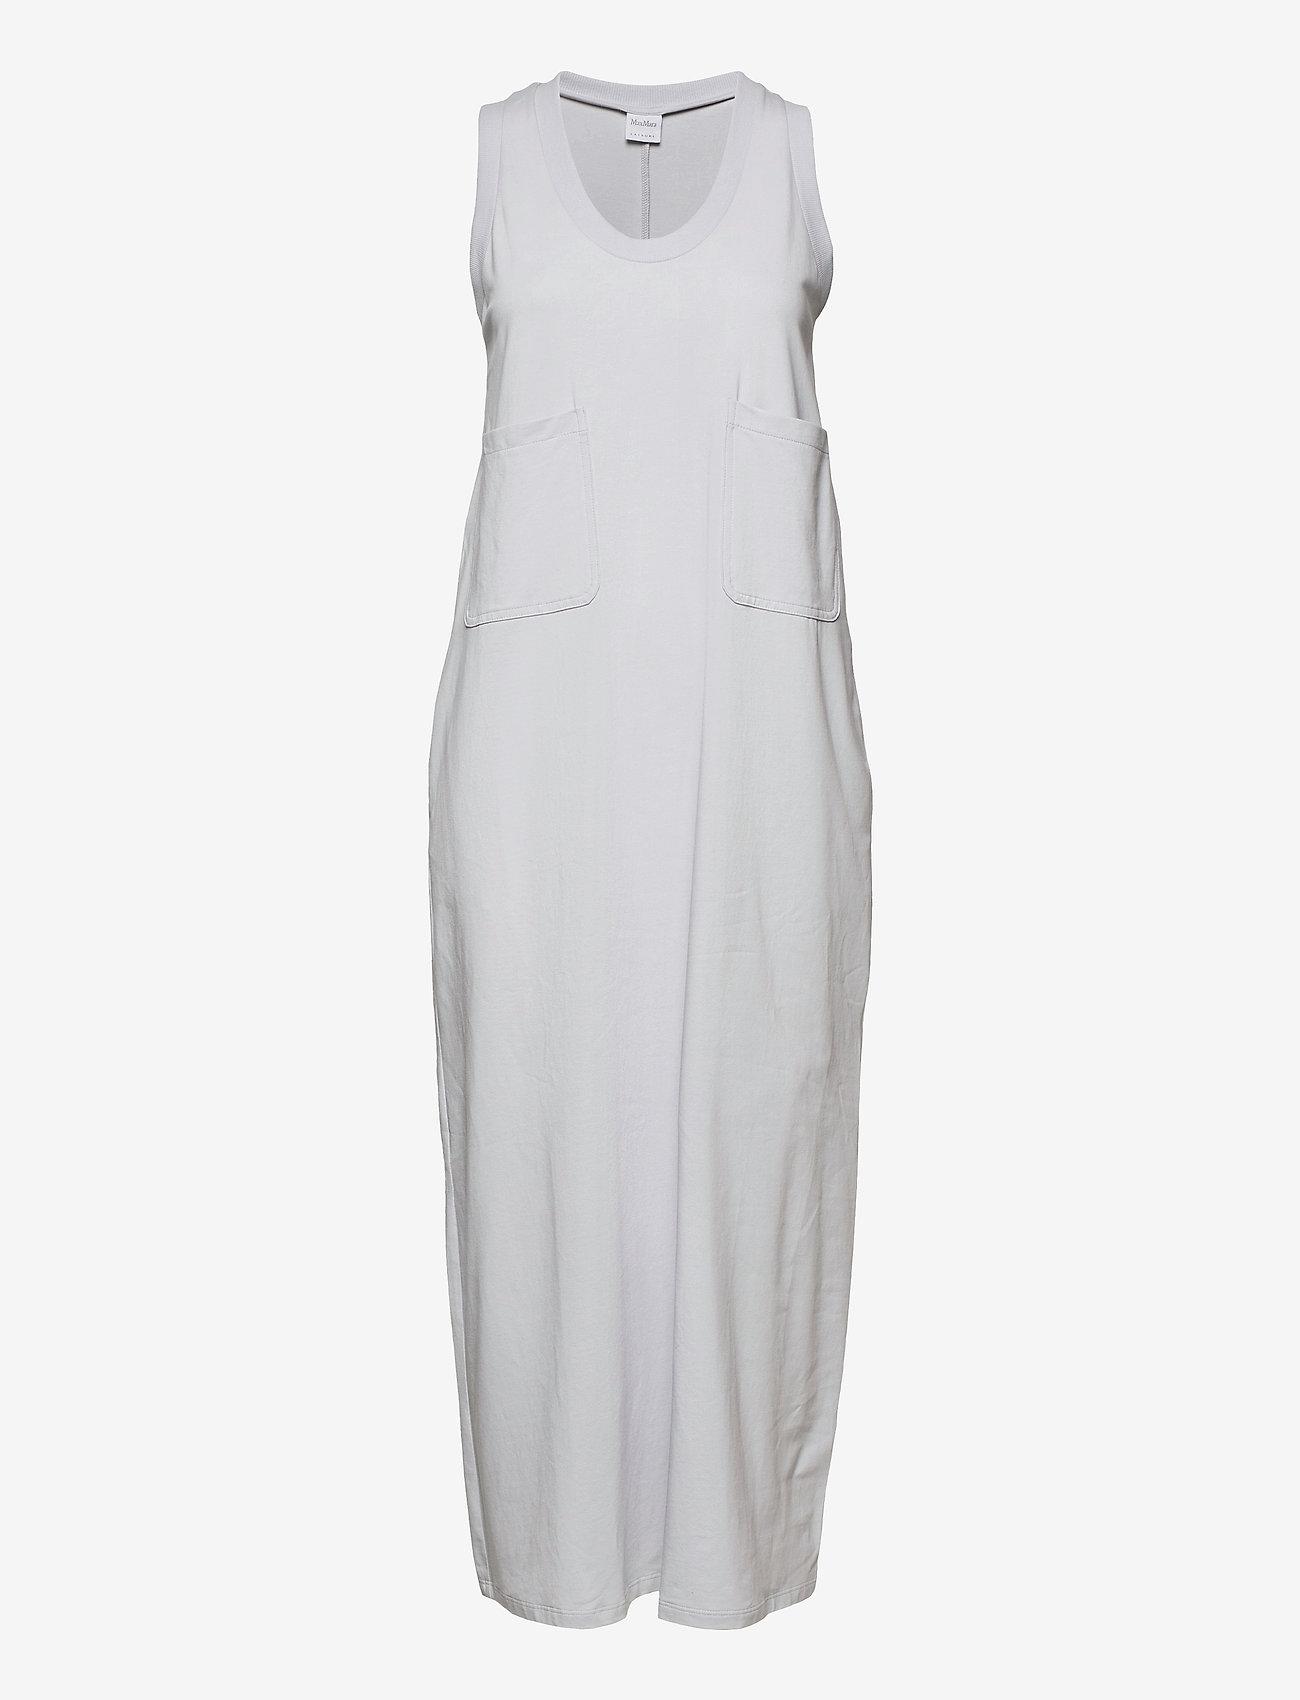 Max Mara Leisure - BAGAGLI - maxi dresses - light grey - 0